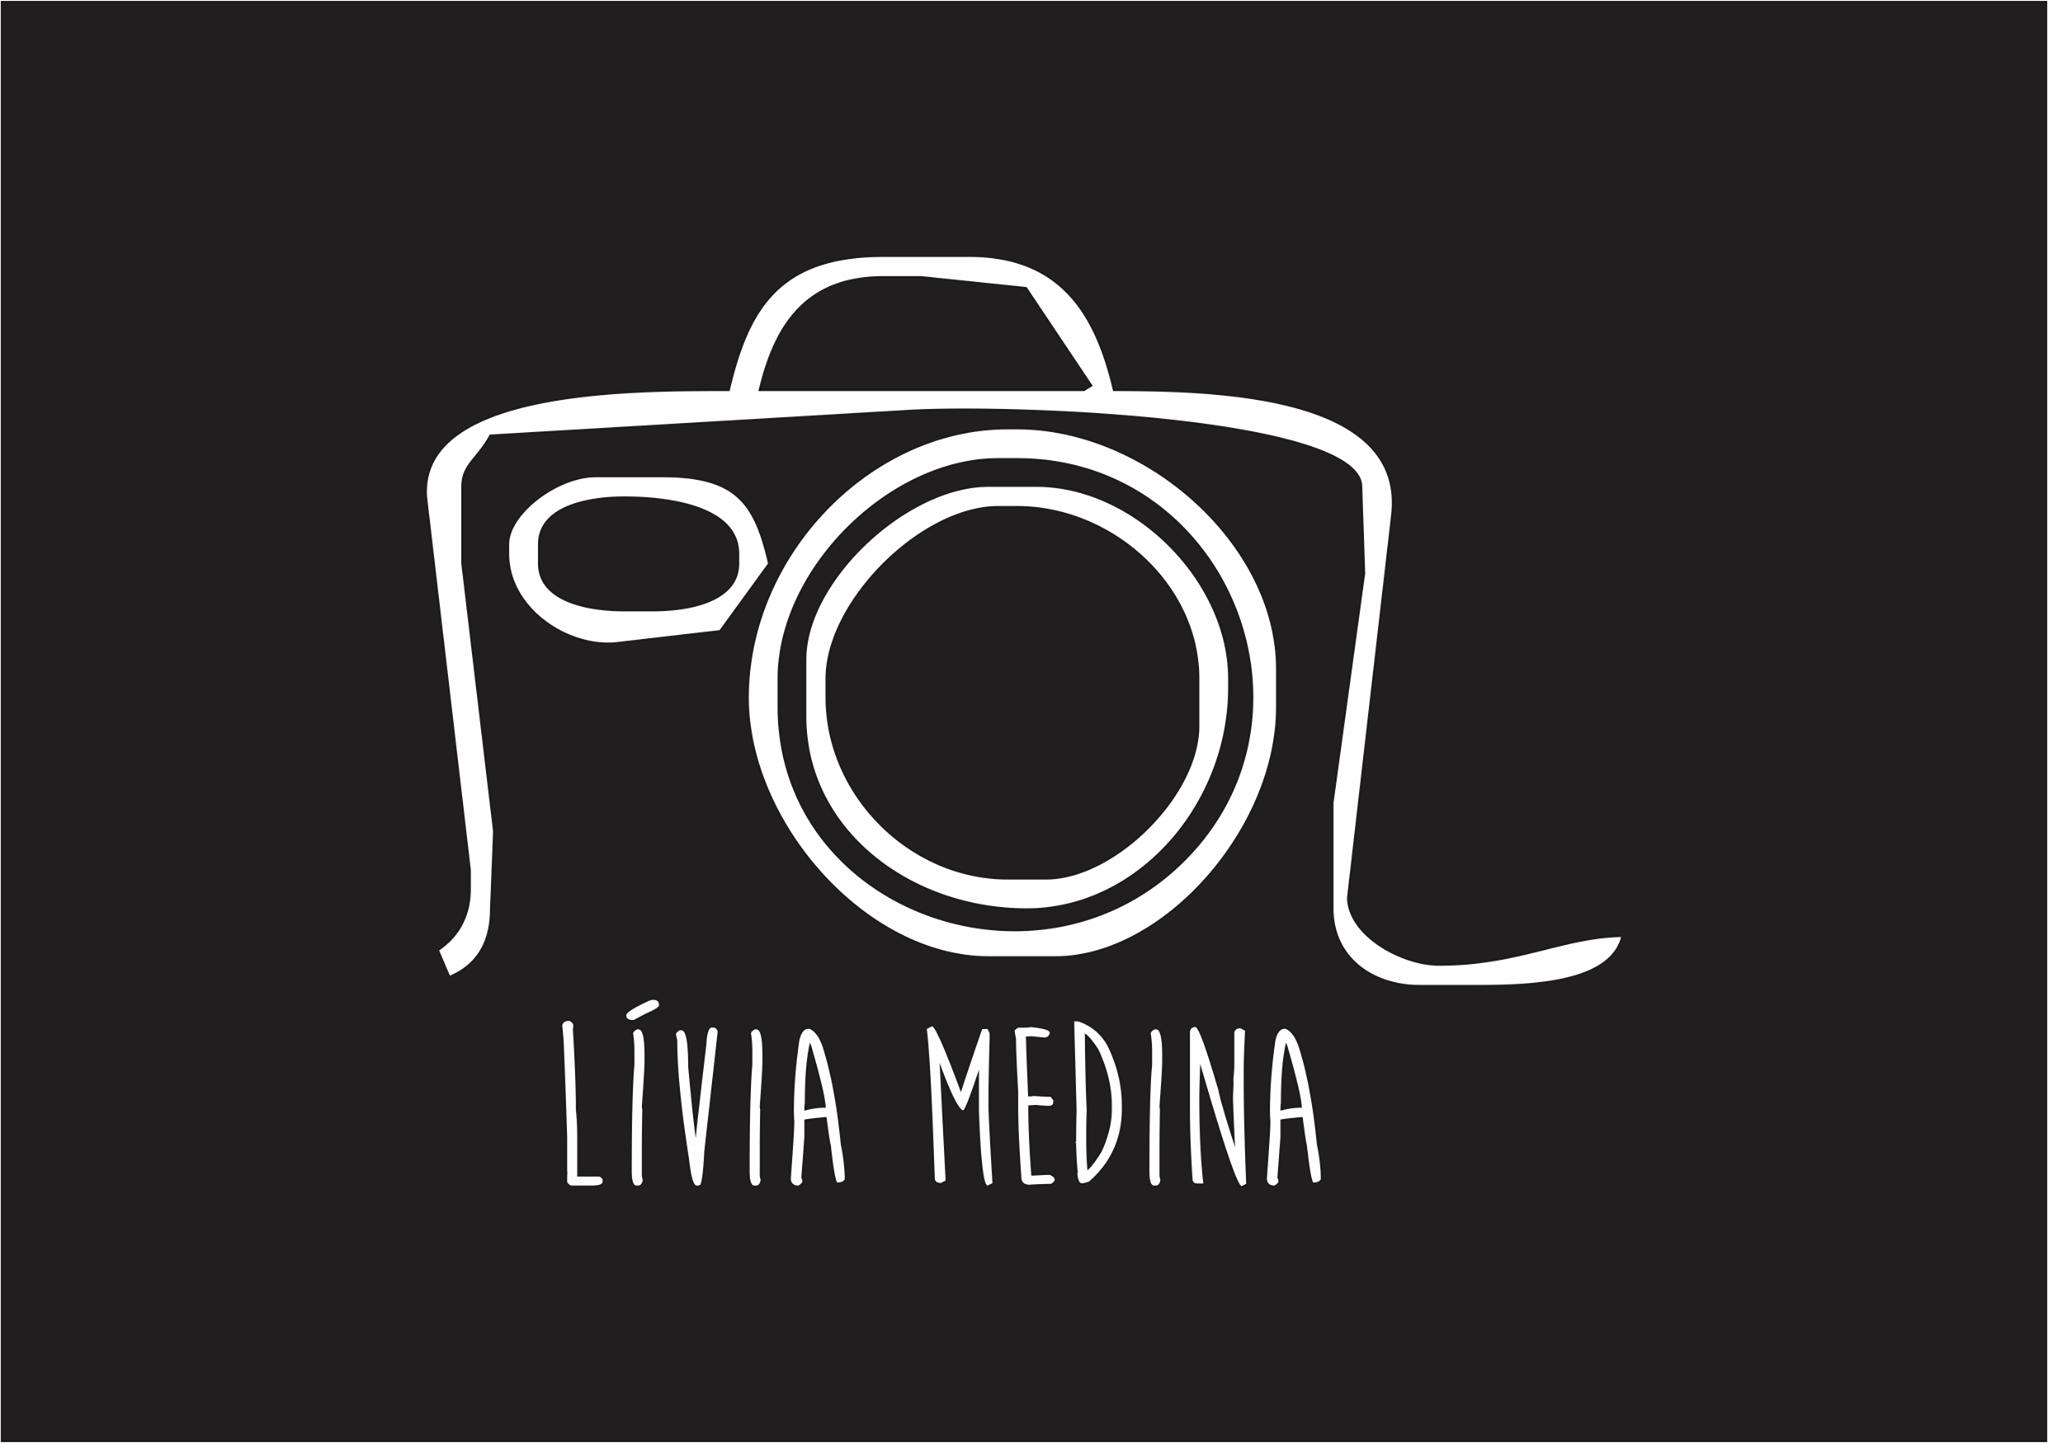 Lívia Medina Photos